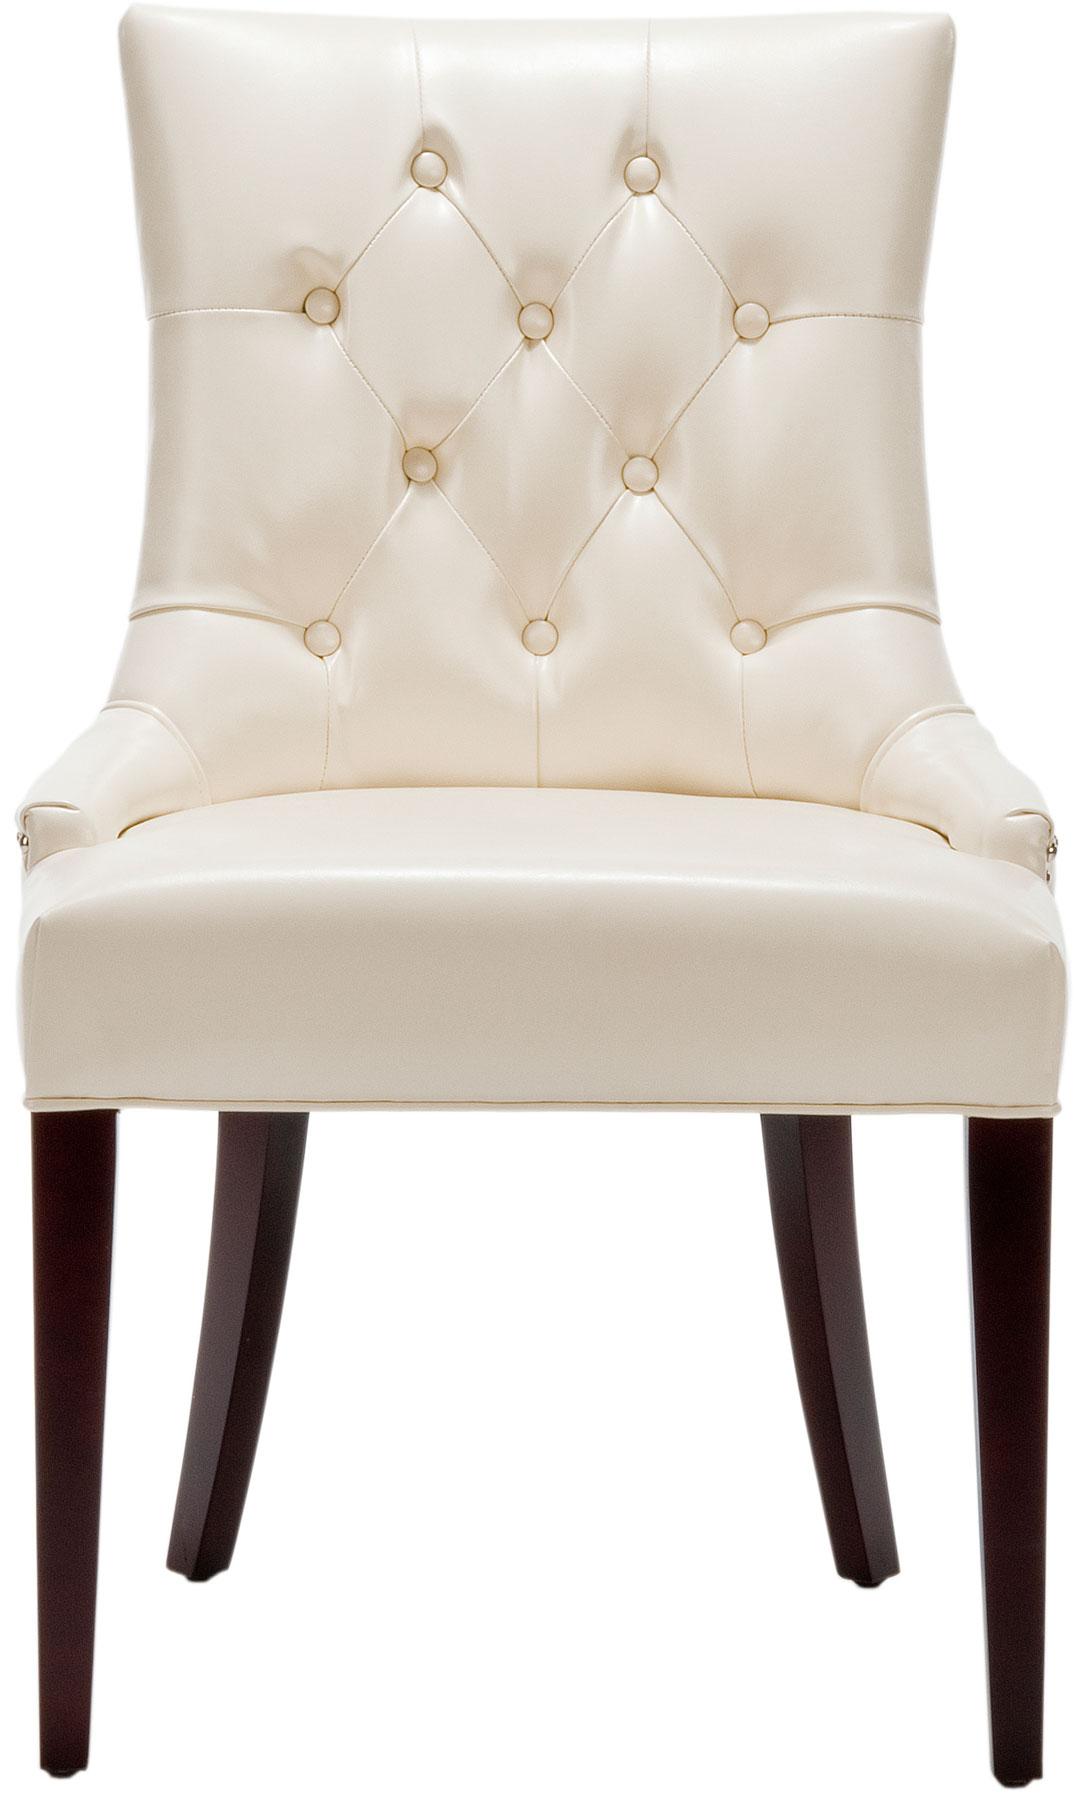 MCR4515B Dining Chairs - Furniture by Safavieh  Safavieh